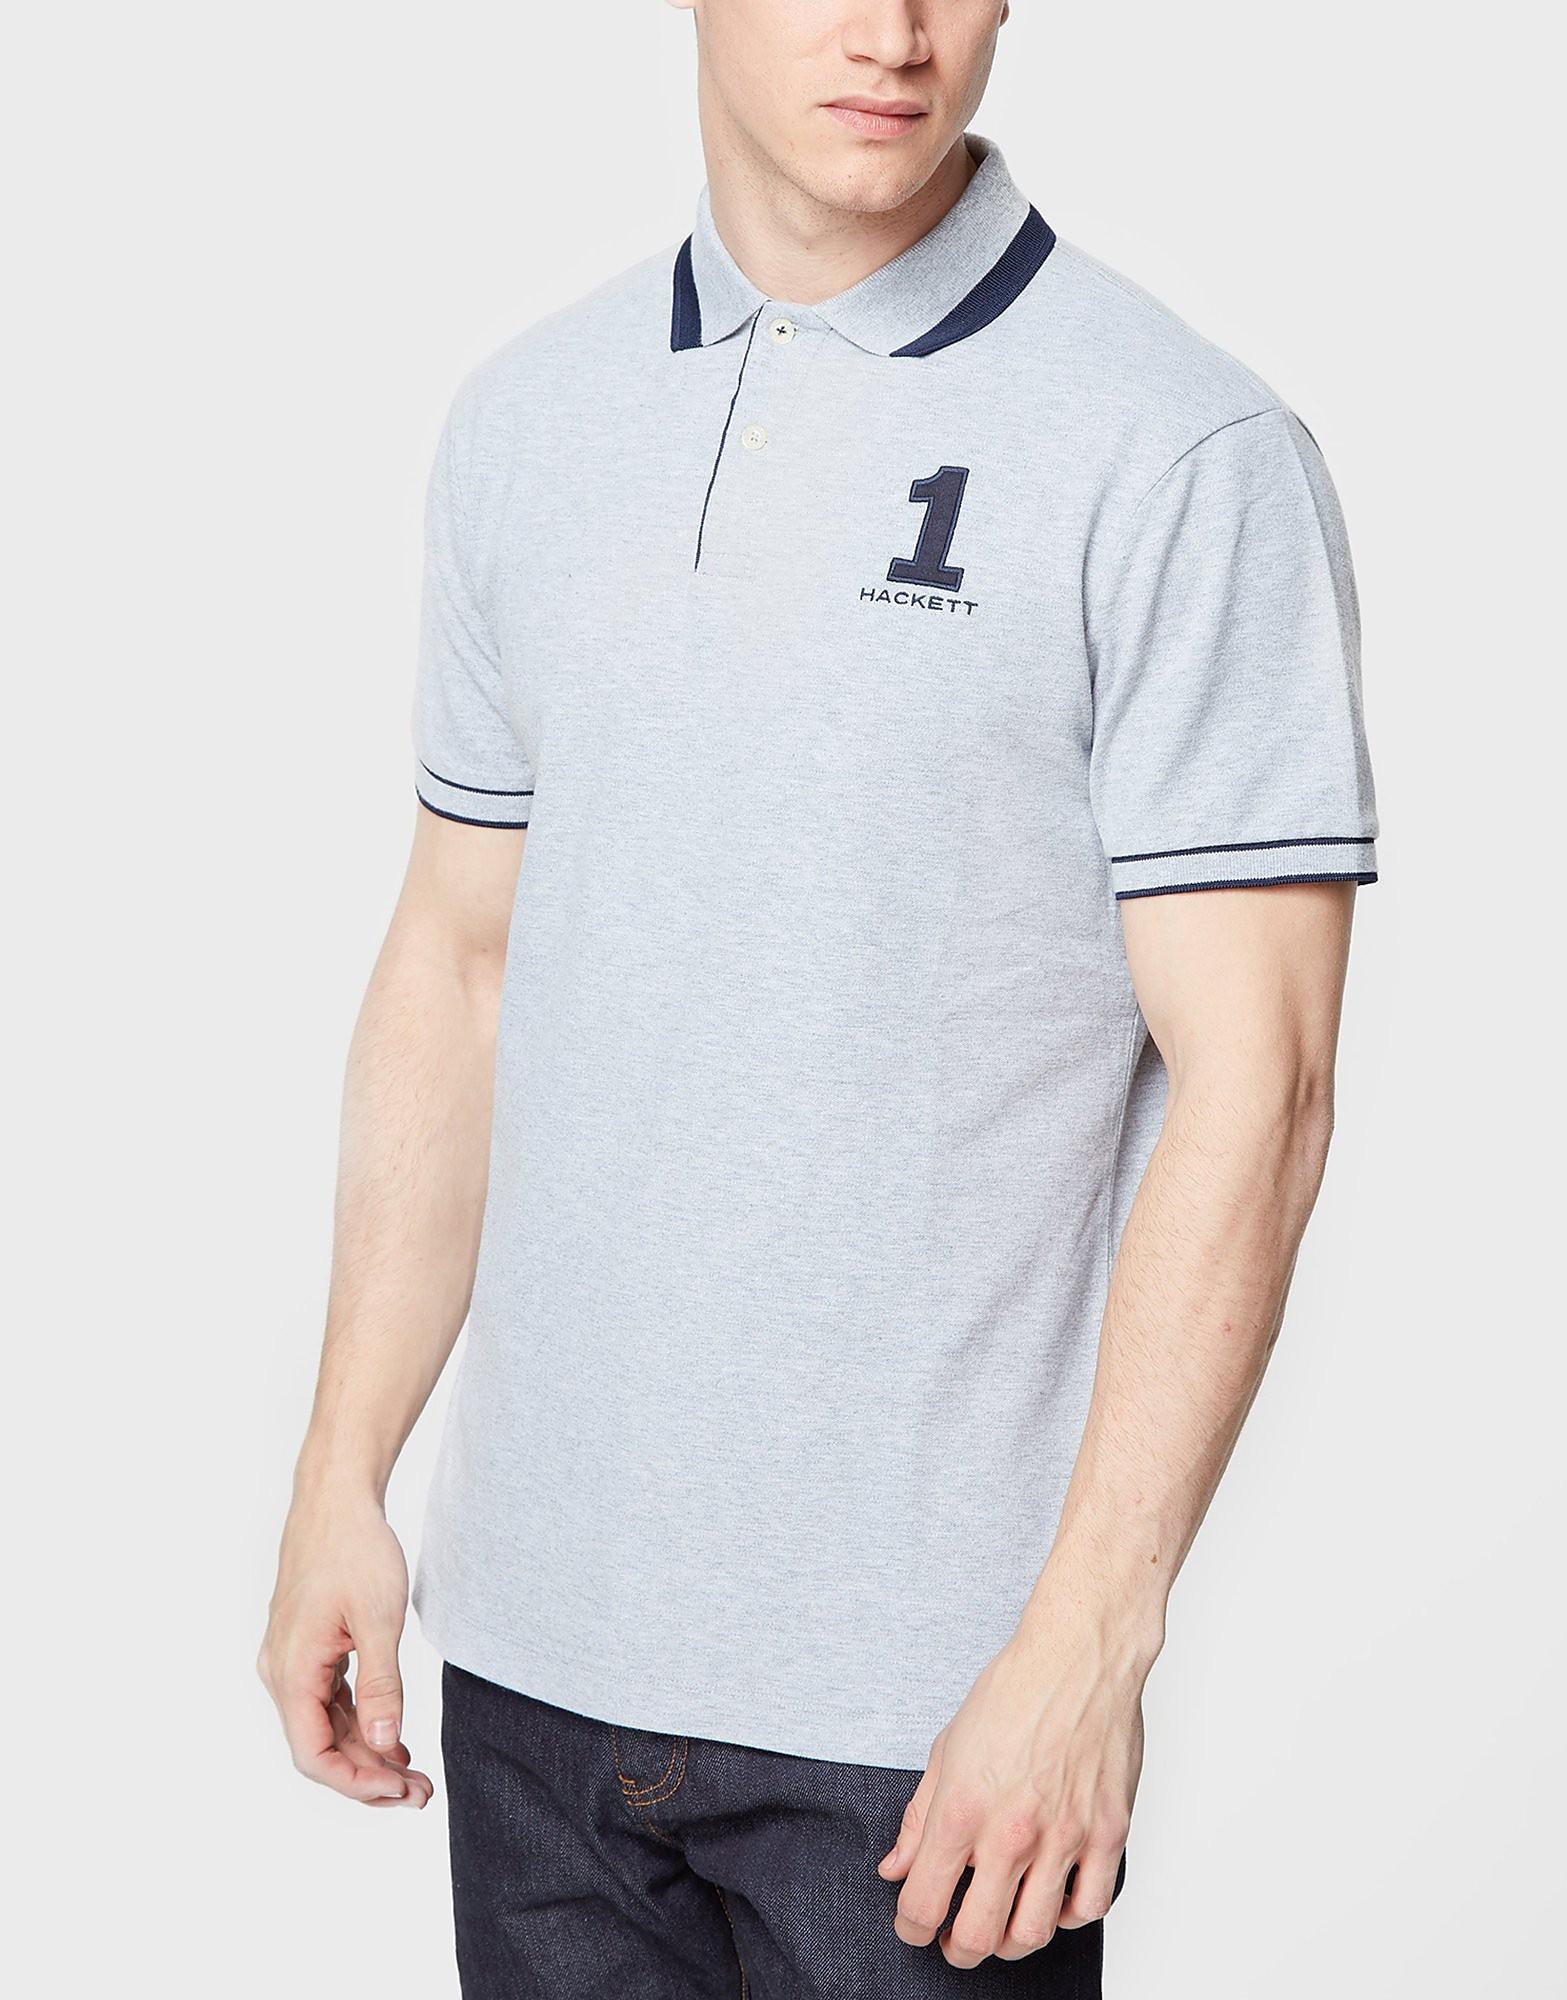 HACKETT Number 1 Polo Shirt